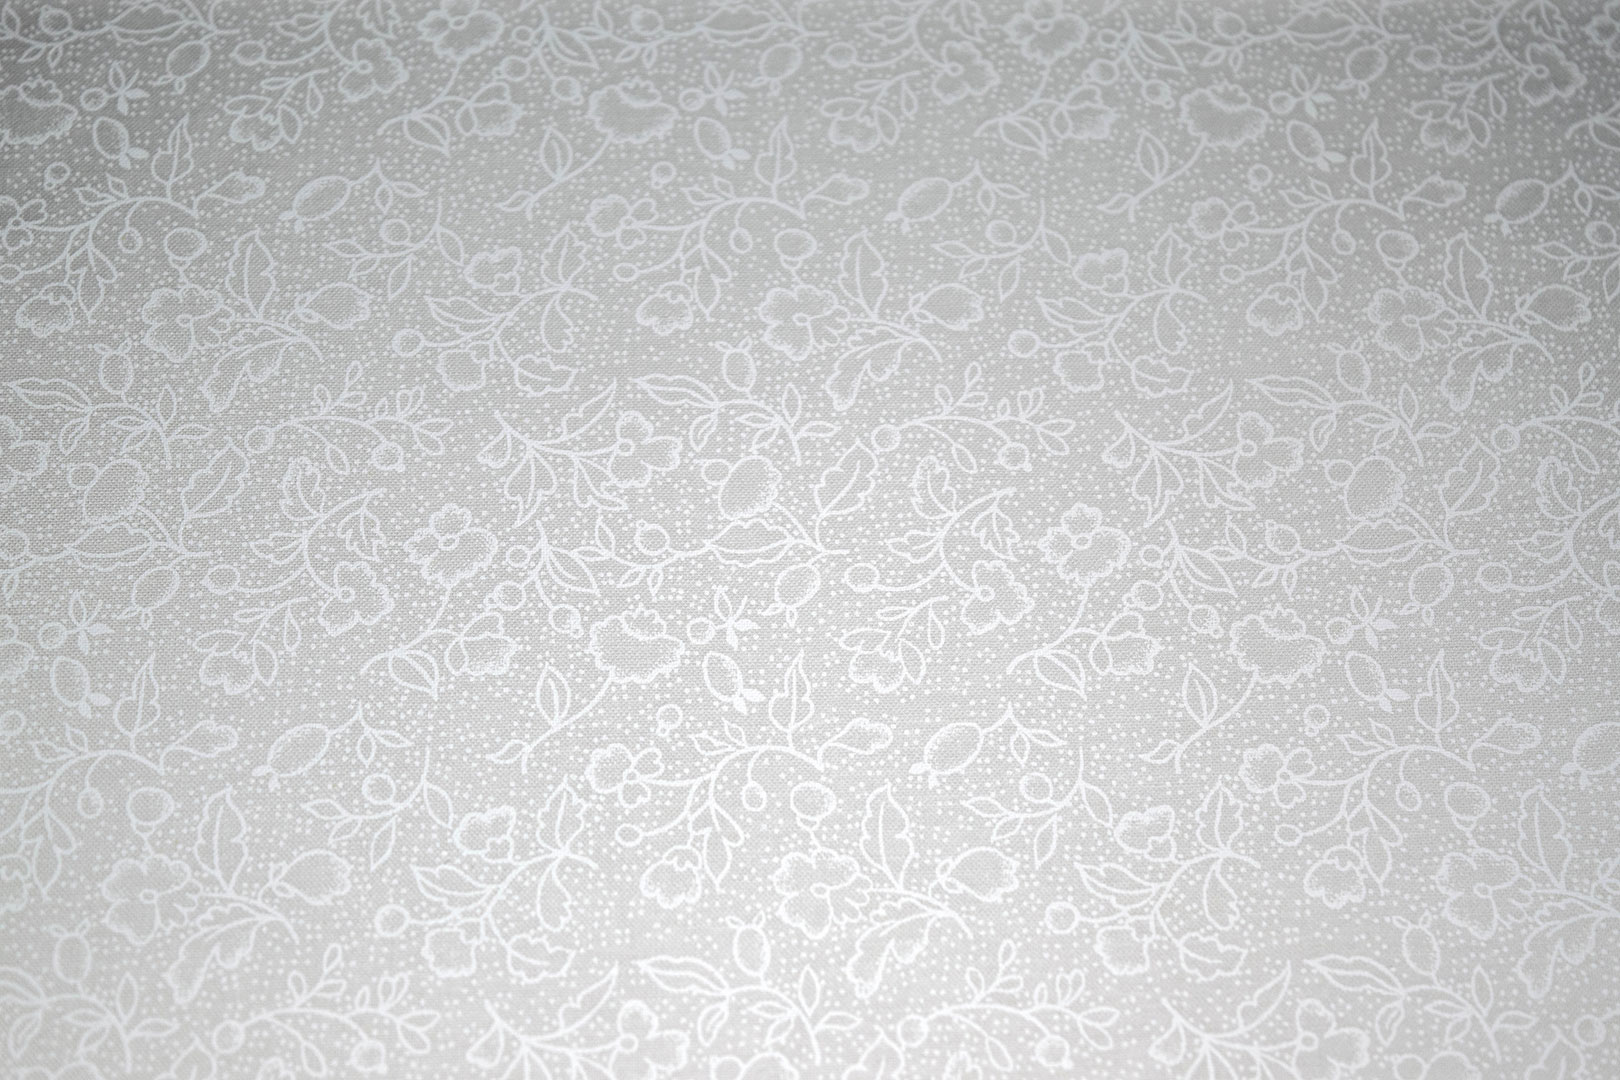 "8_21677_ww   44/45"" 68/68, 100% Carded Cotton"